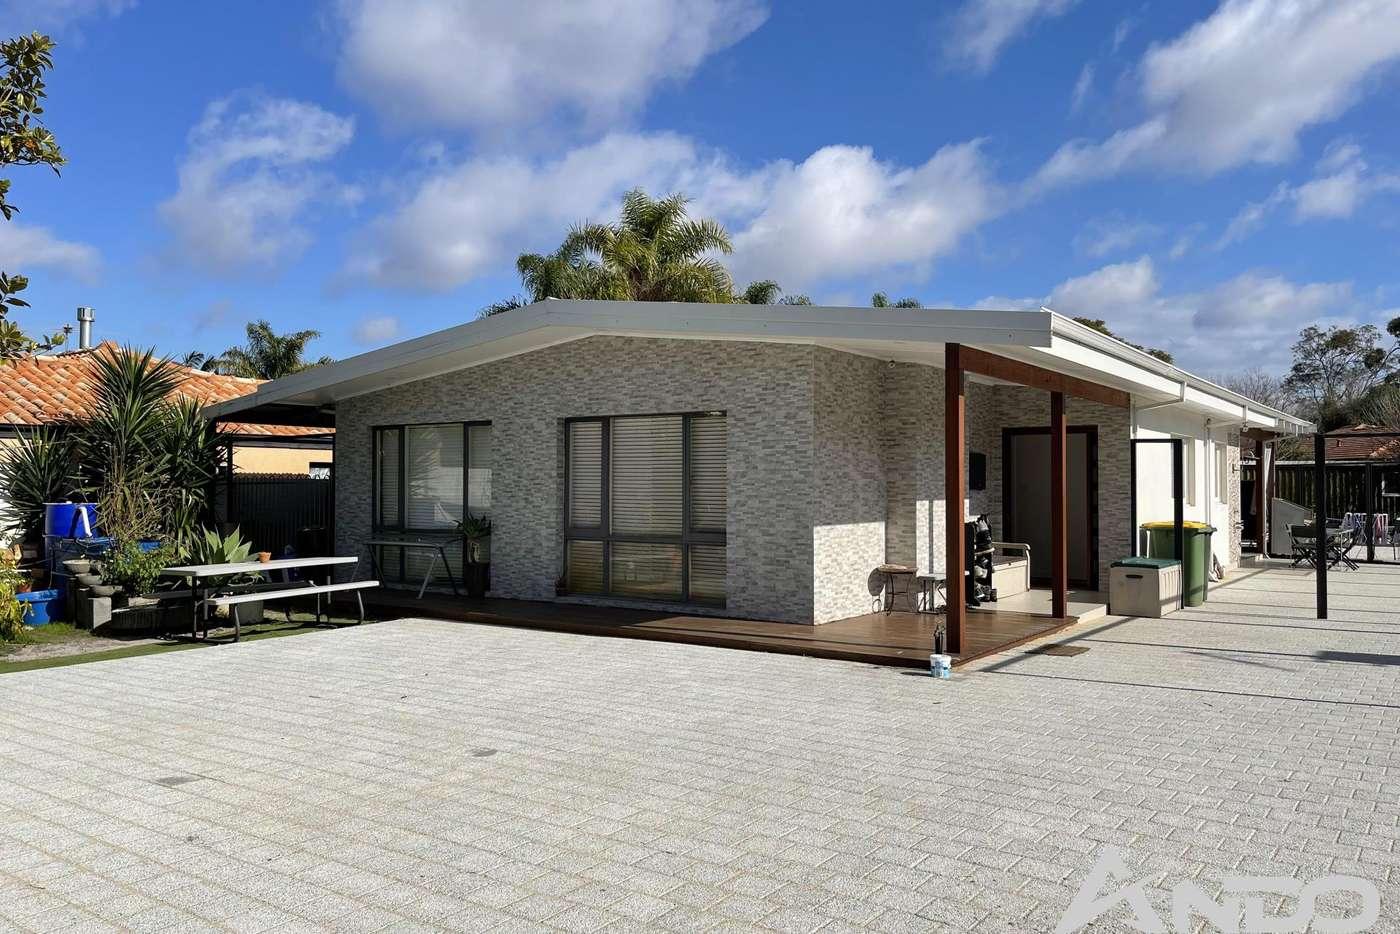 Main view of Homely residentialLand listing, 1/72 Bull Creek Road, Rossmoyne WA 6148